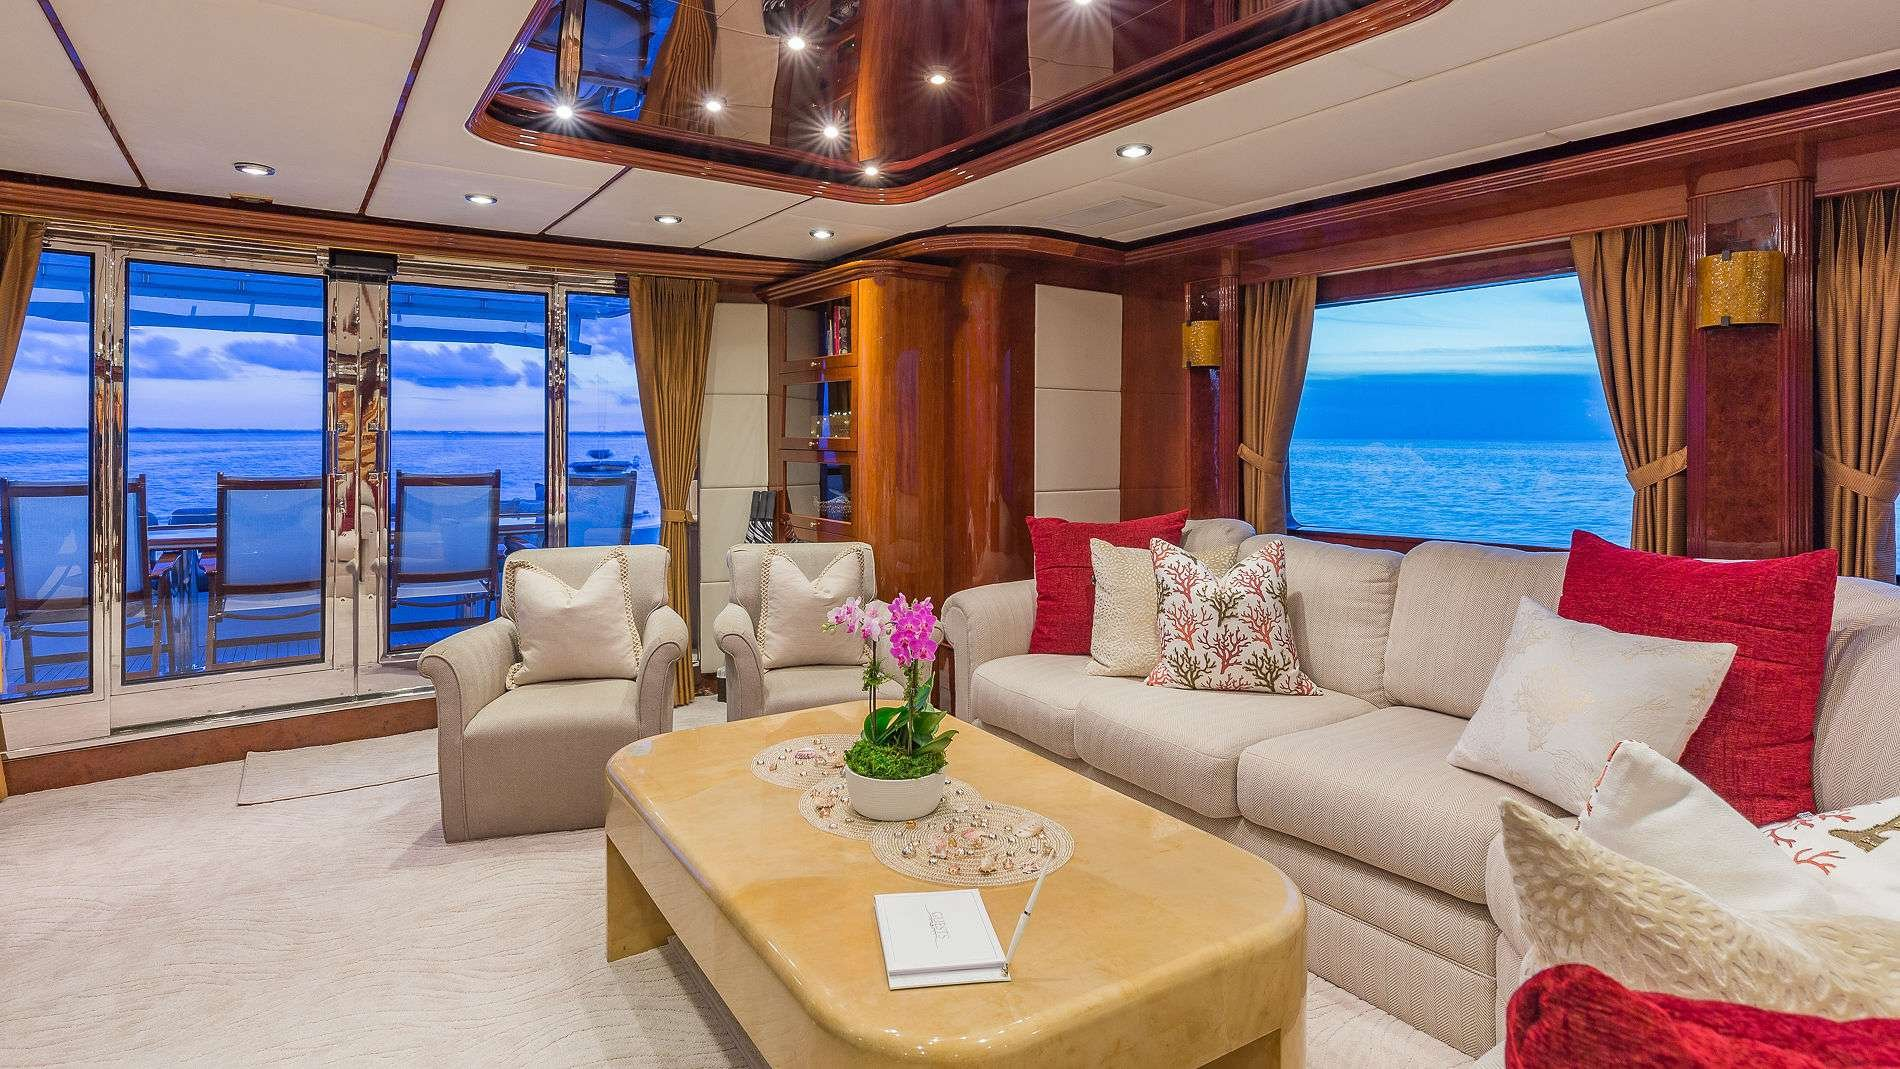 Motor Yacht 'QUINTESSA' Main Salon Looking Aft, 8 PAX, 4 Crew, 94.00 Ft, 28.00 Meters, Built 2000, Destiny, Refit Year 2019